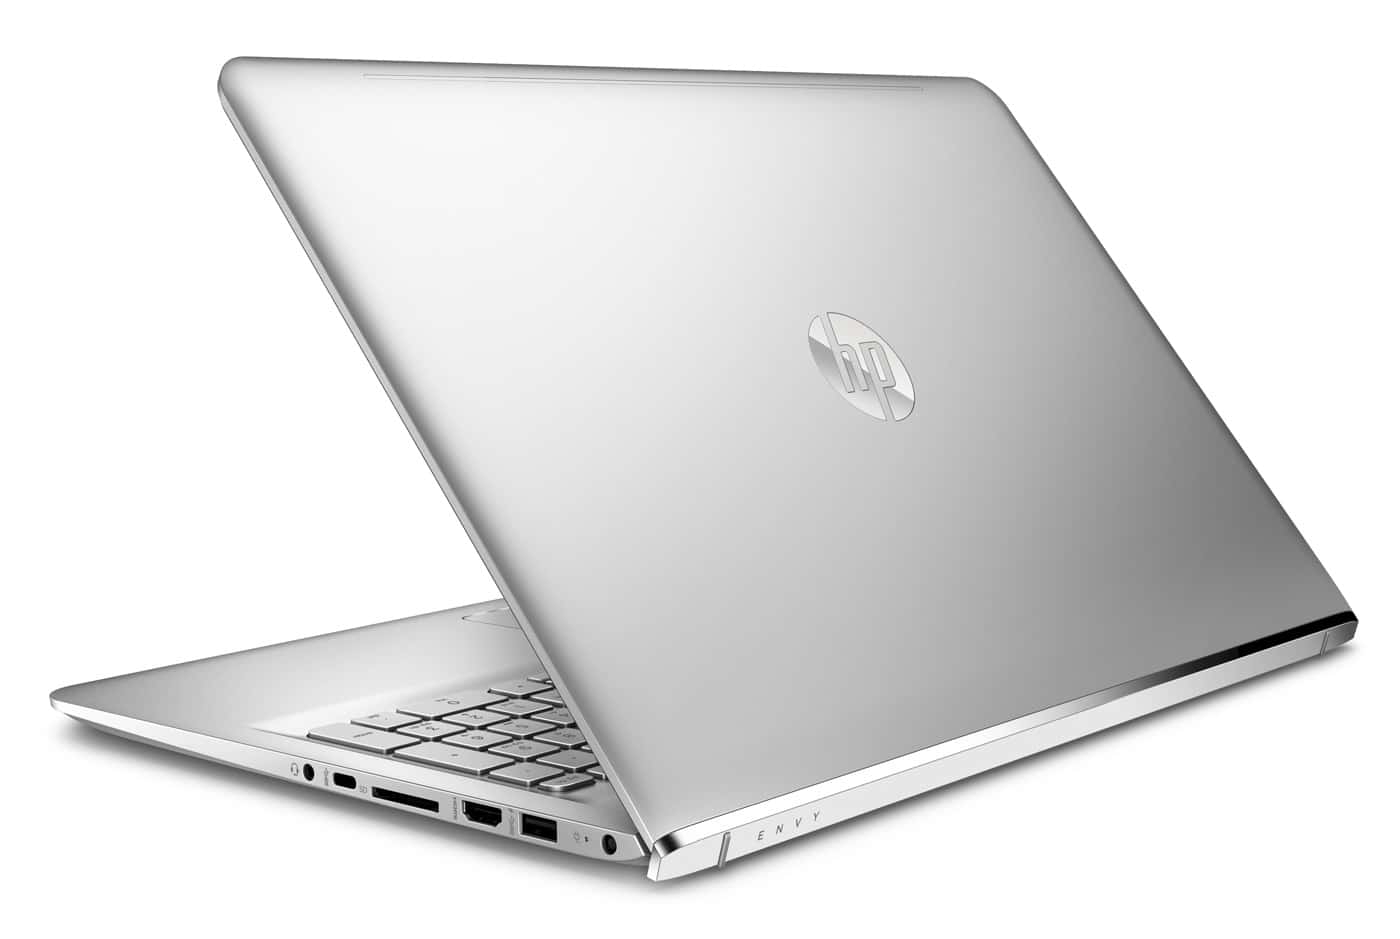 HP Envy 15-as107nf, ultrabook 15 pouces léger i7 Kaby SSD256 16Go Iris à 1148€